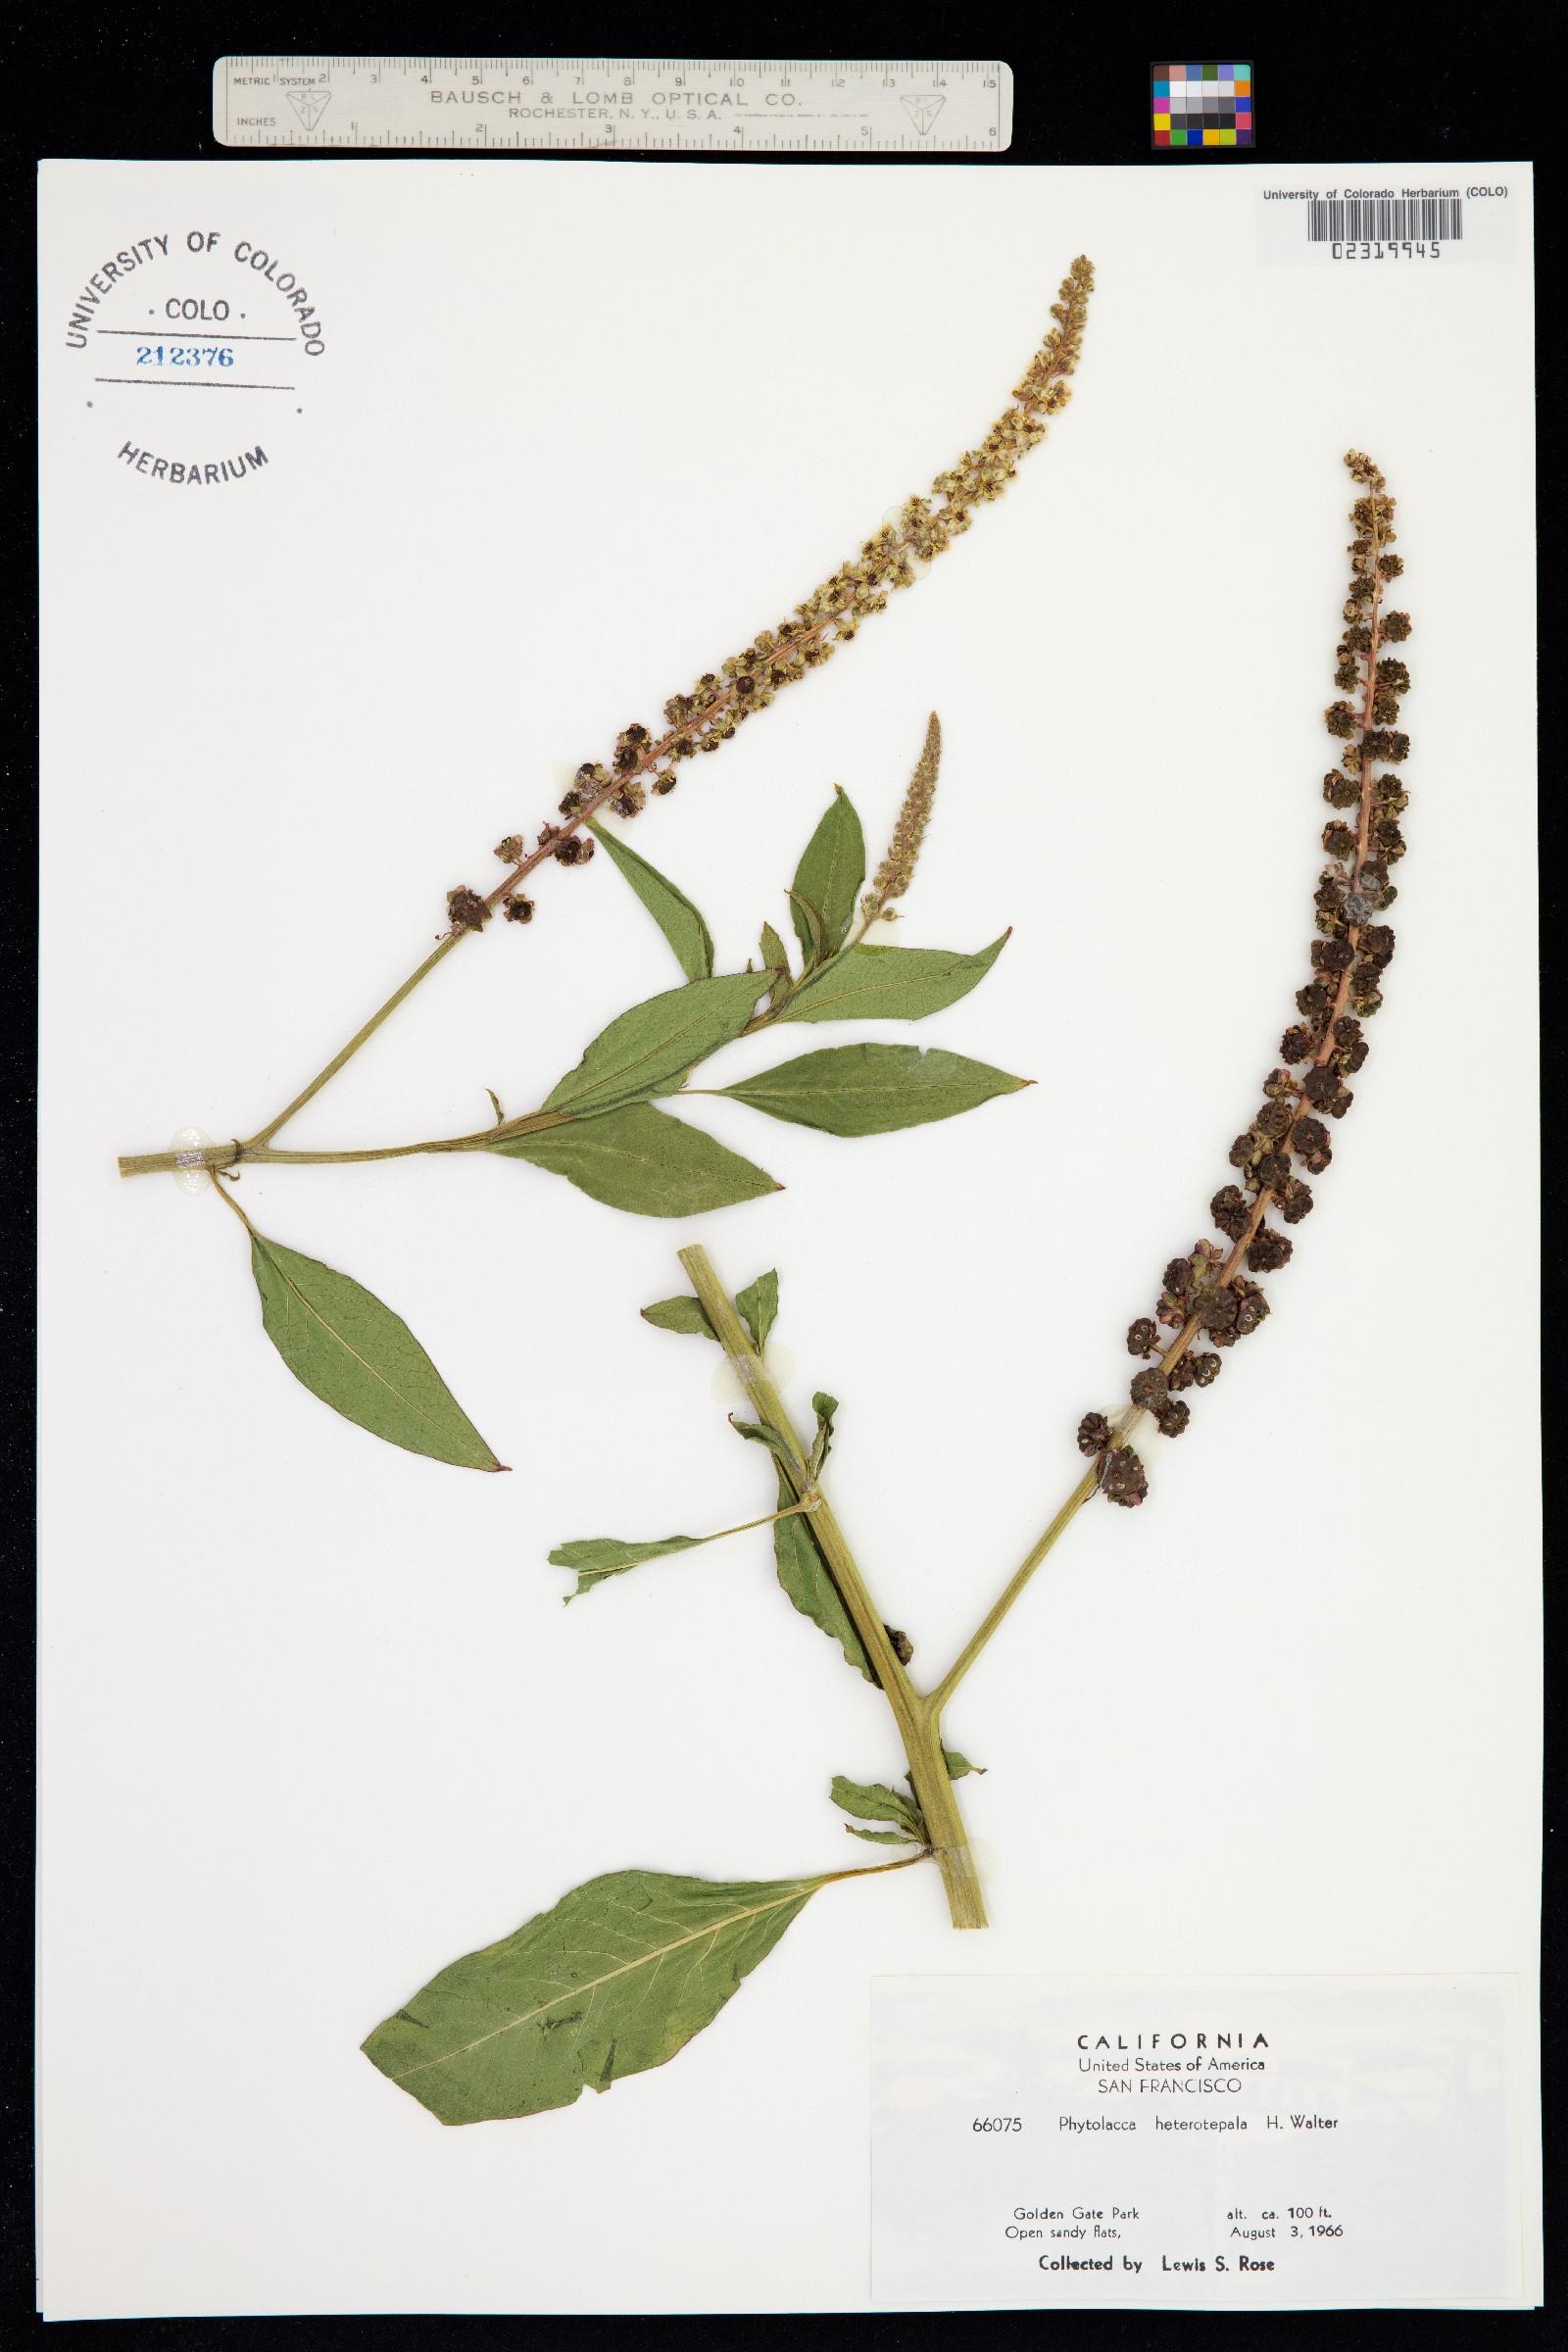 Phytolacca heterotepala image